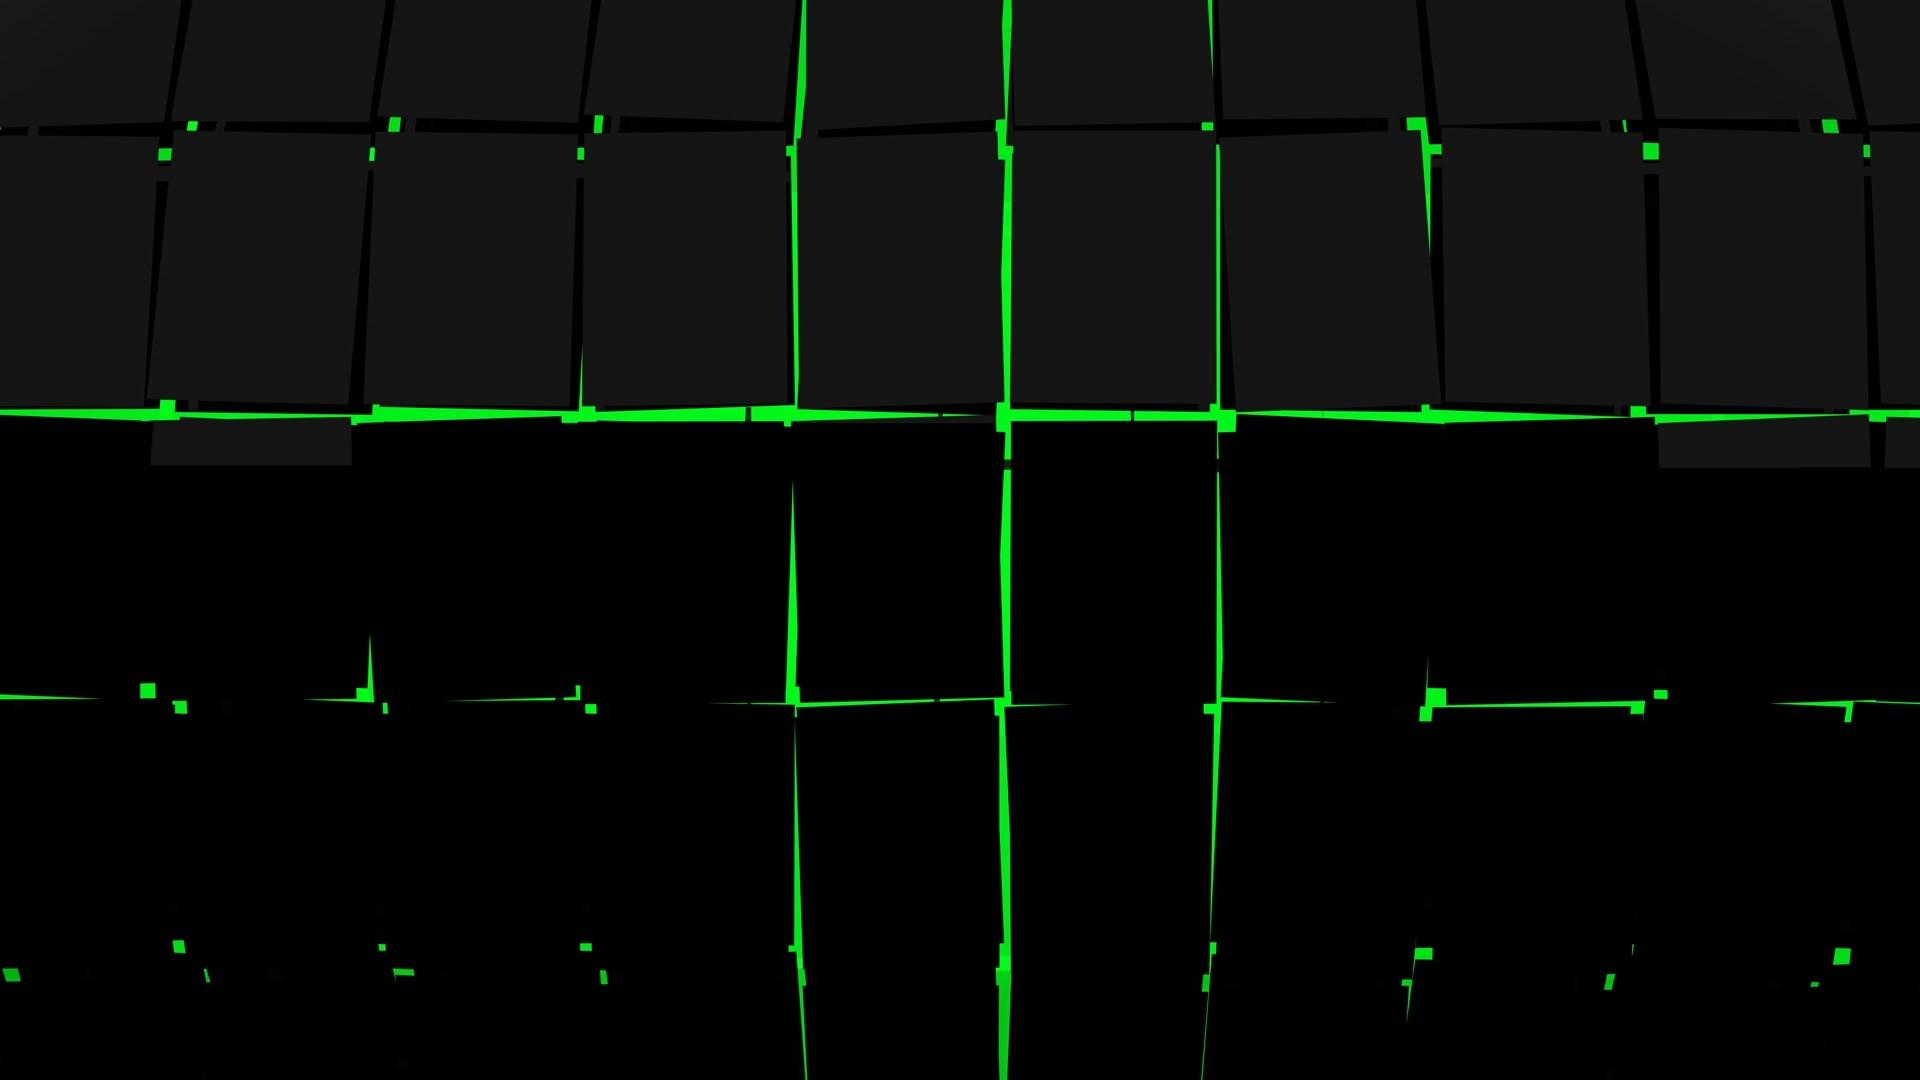 Green Grass HD Wallpapers : Find best latest Green Grass HD Wallpapers for  your PC desktop background & mobile phones. | hd wallpaper | Pinterest |  Green …